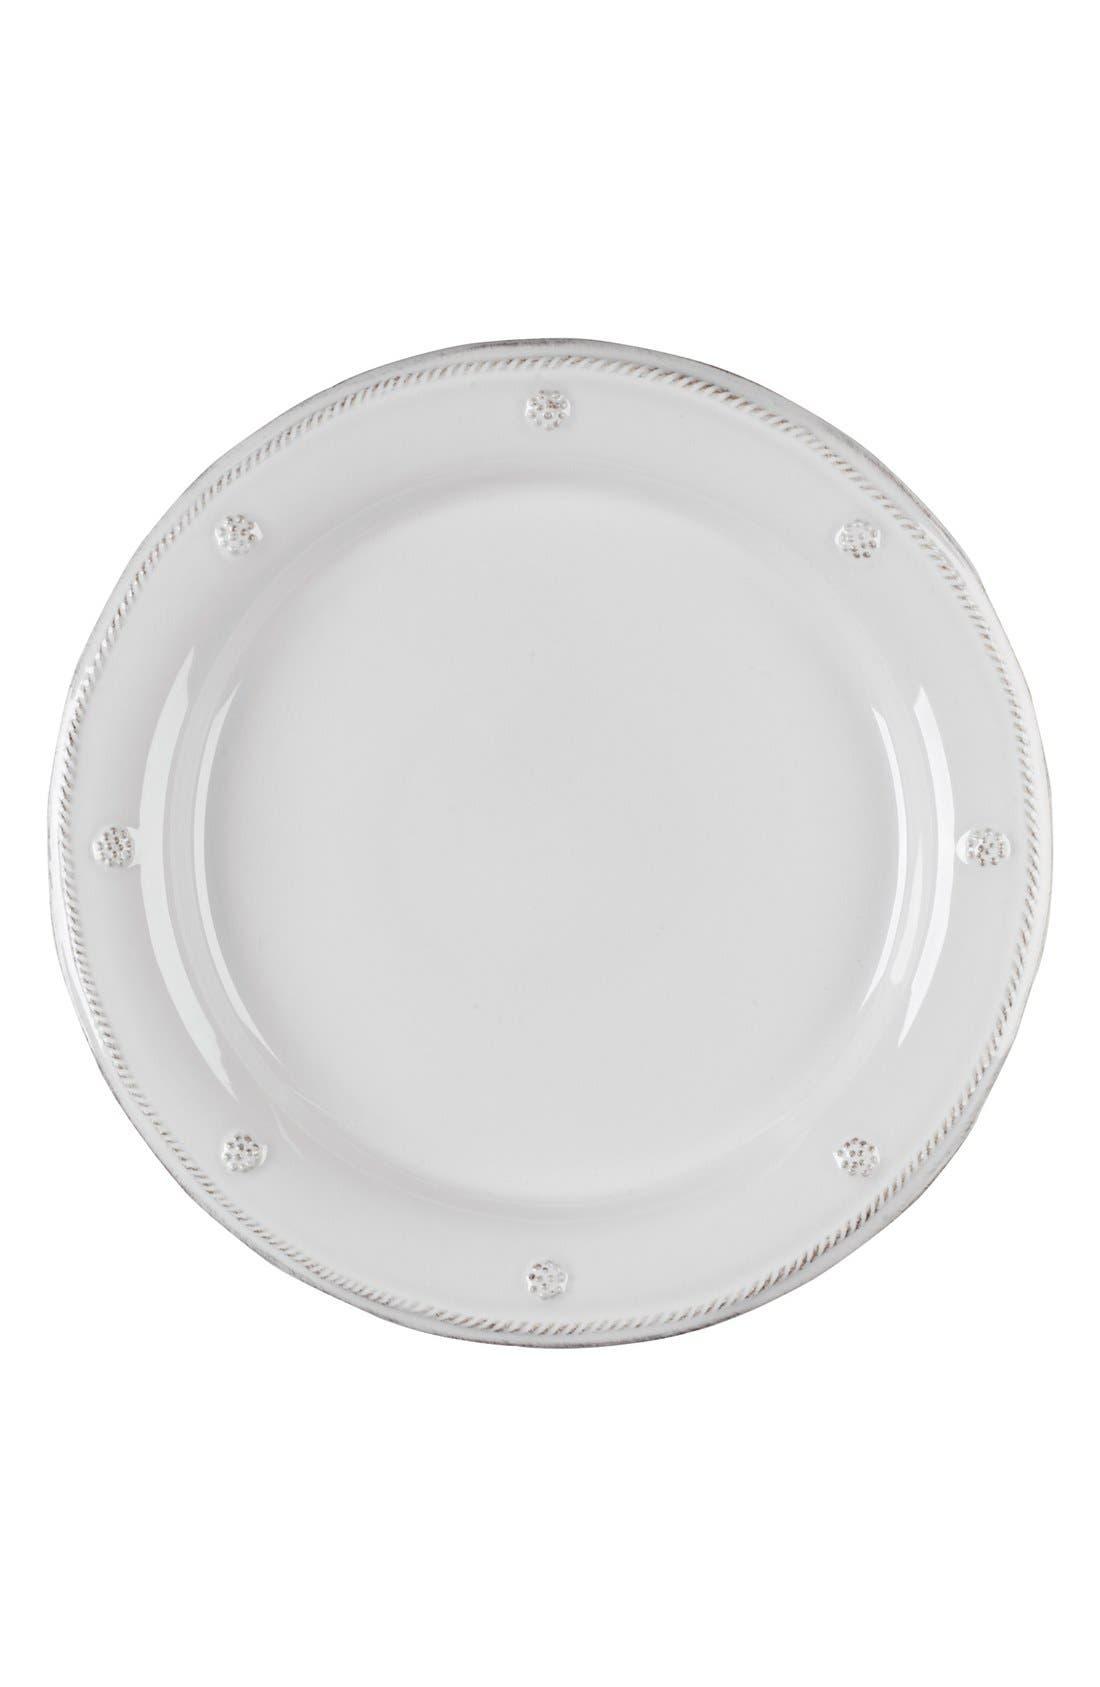 Main Image - Juliska 'Berry and Thread' Dinner Plate